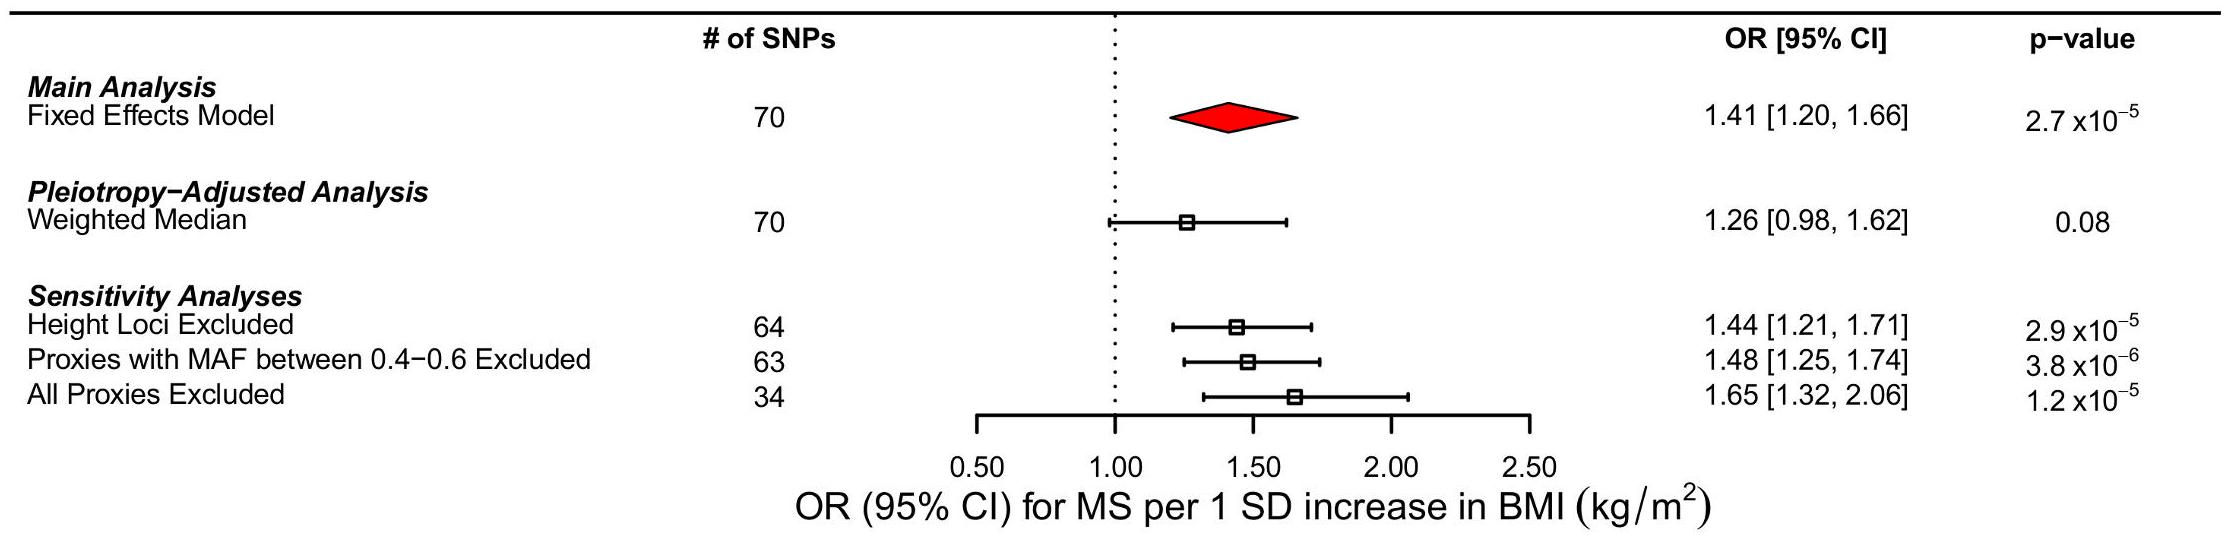 Forest plot of MR estimates.